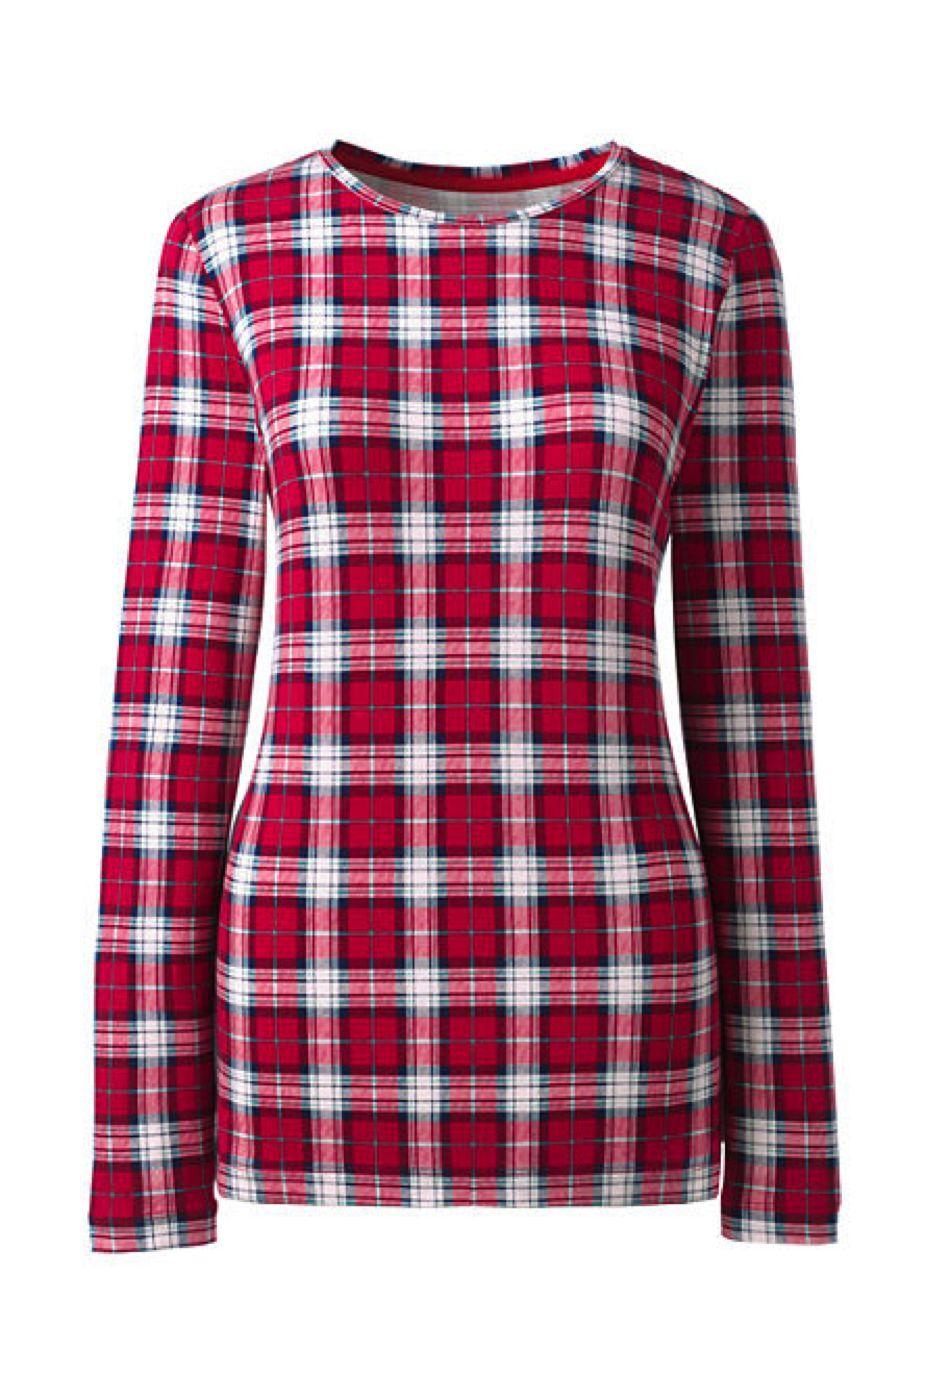 Lands End Damen M Nwt Rot Urlaub Mehrfarbig Kariert Langarm Layer T-Hemd